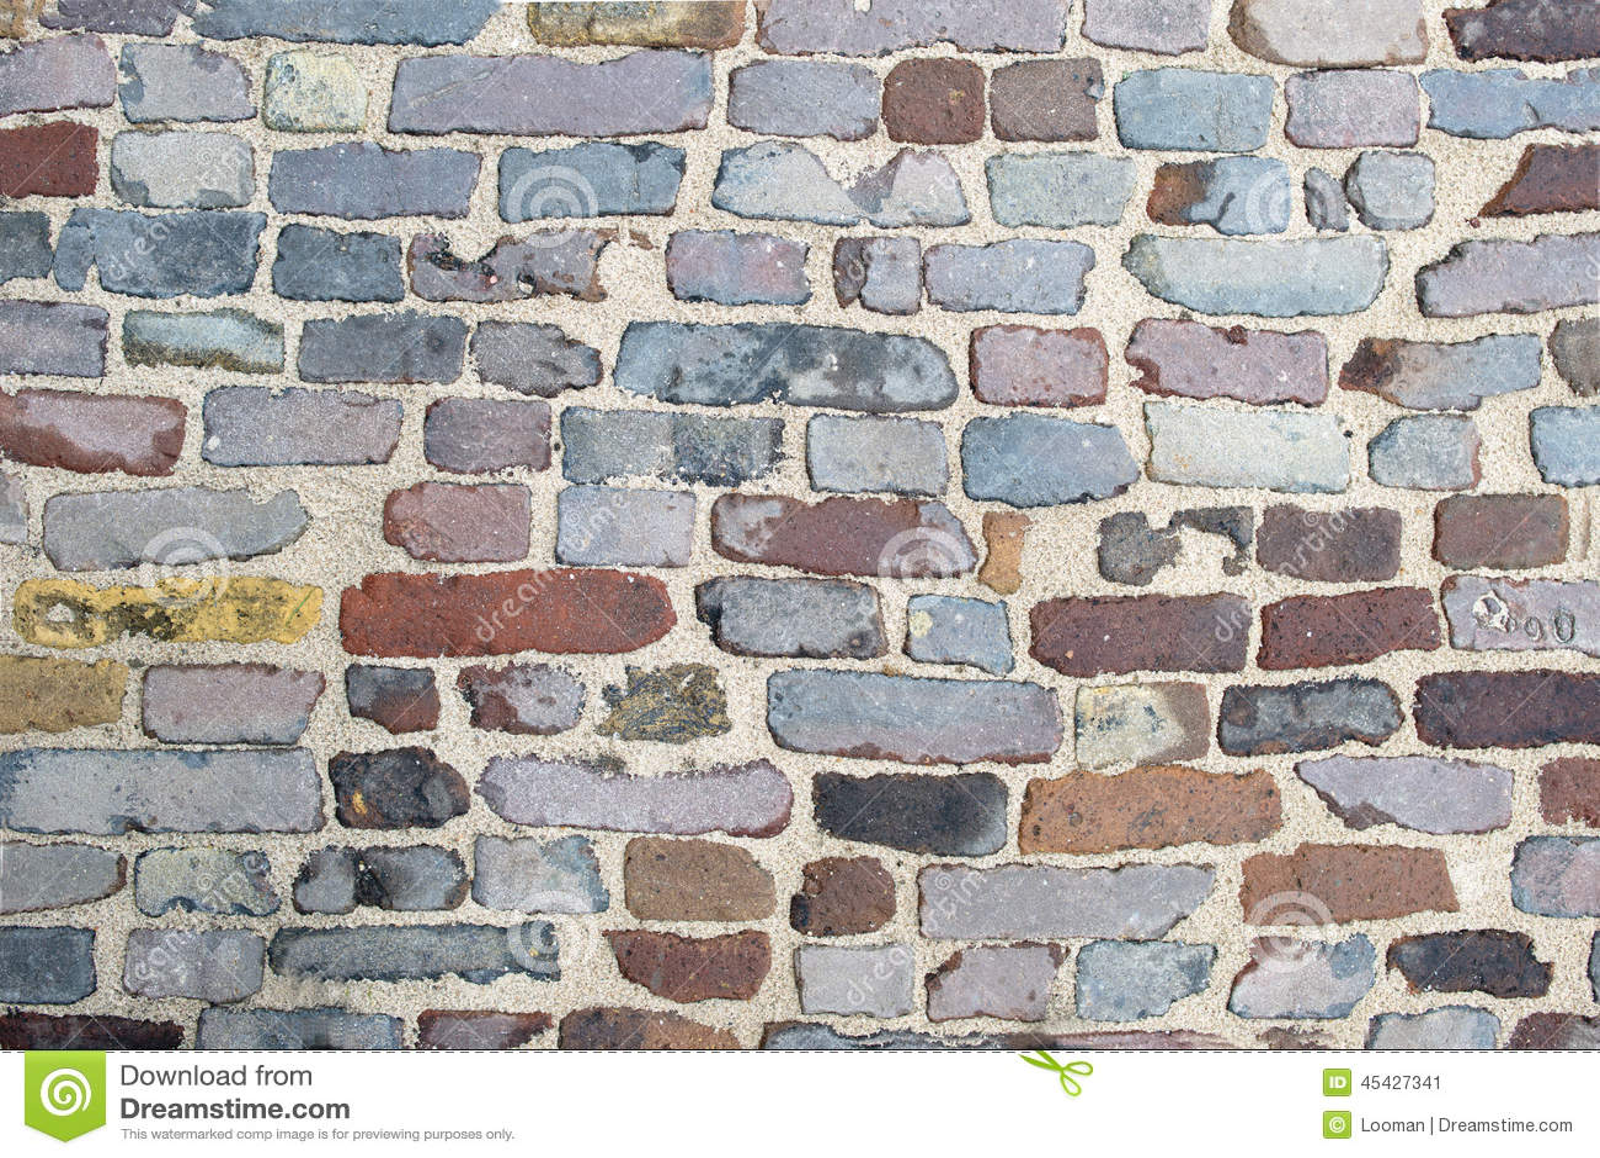 Old brick pattern texture